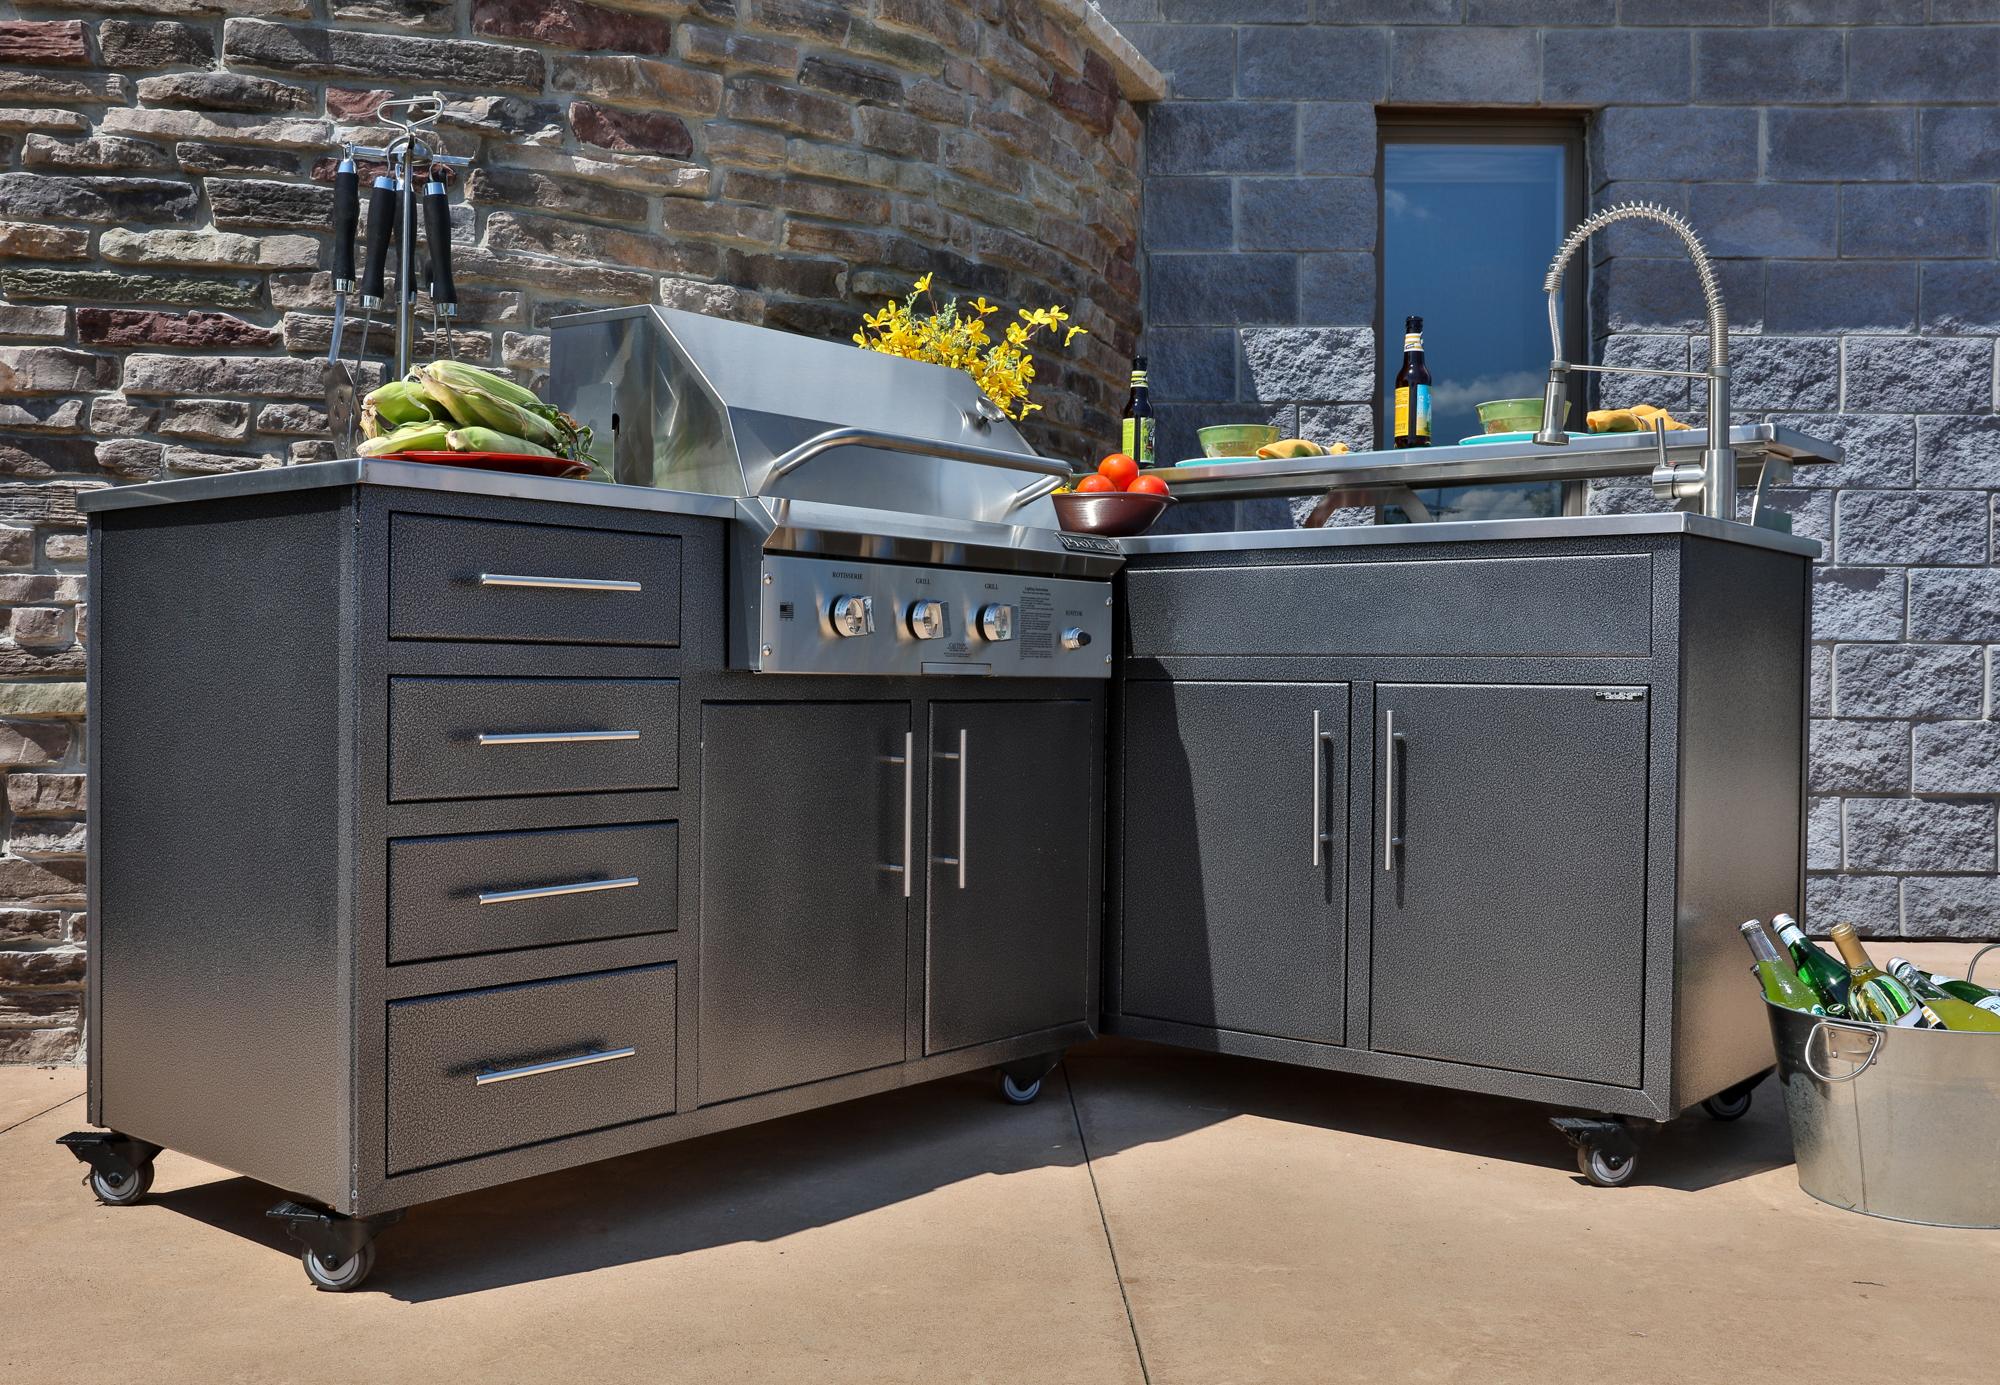 modular outdoor kitchens cd-precon.jpg?t-1474738053 ERTLBBD